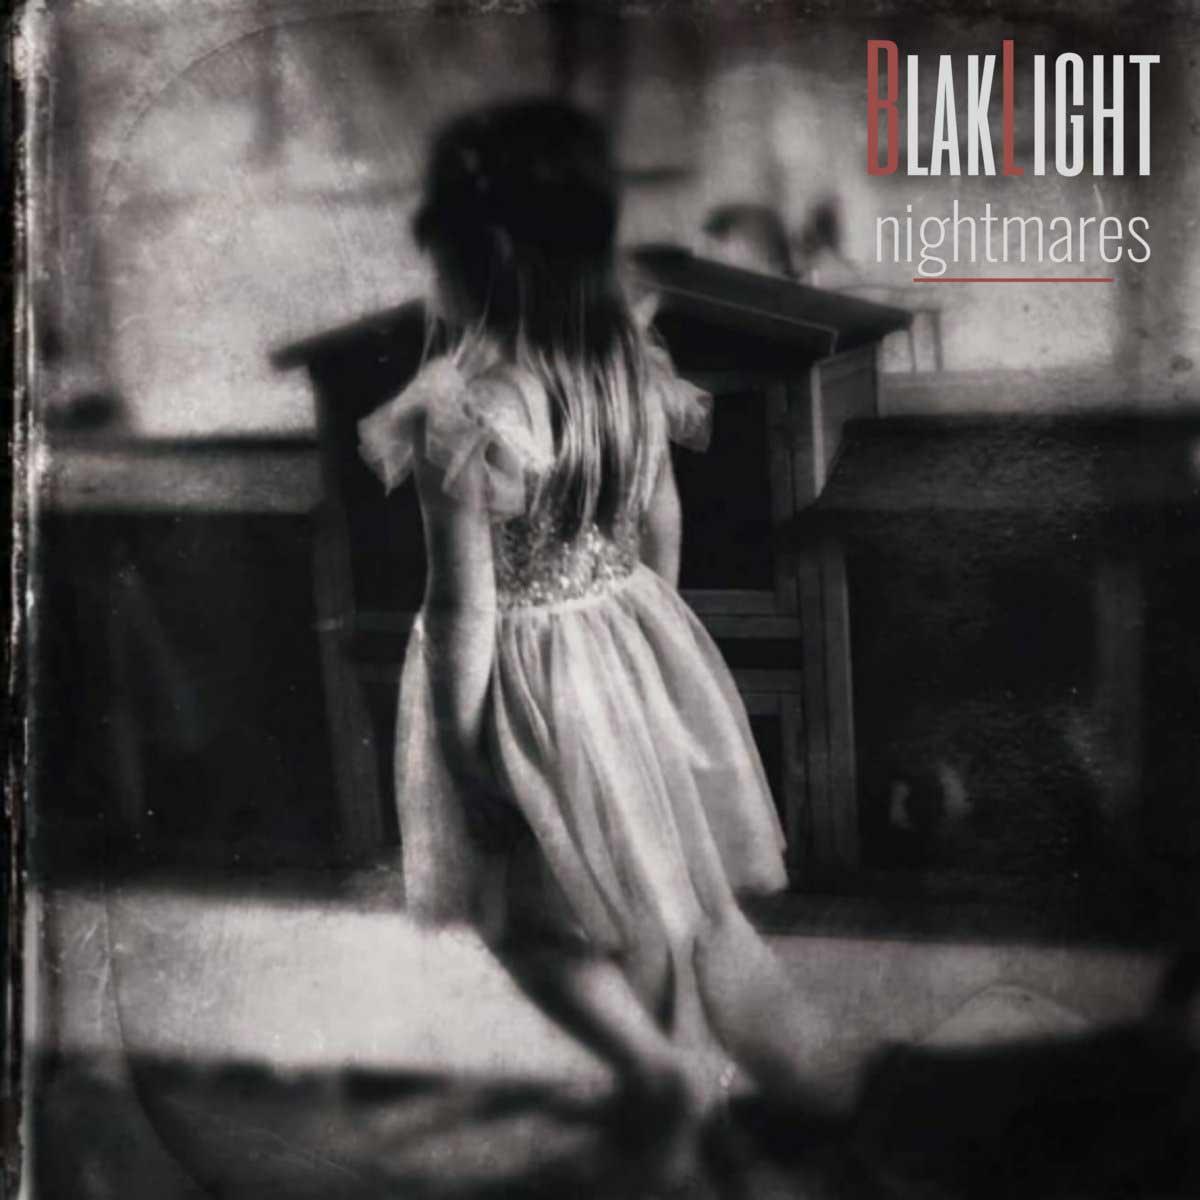 BlakLight - Nightmares - BlakLight - Nightmares